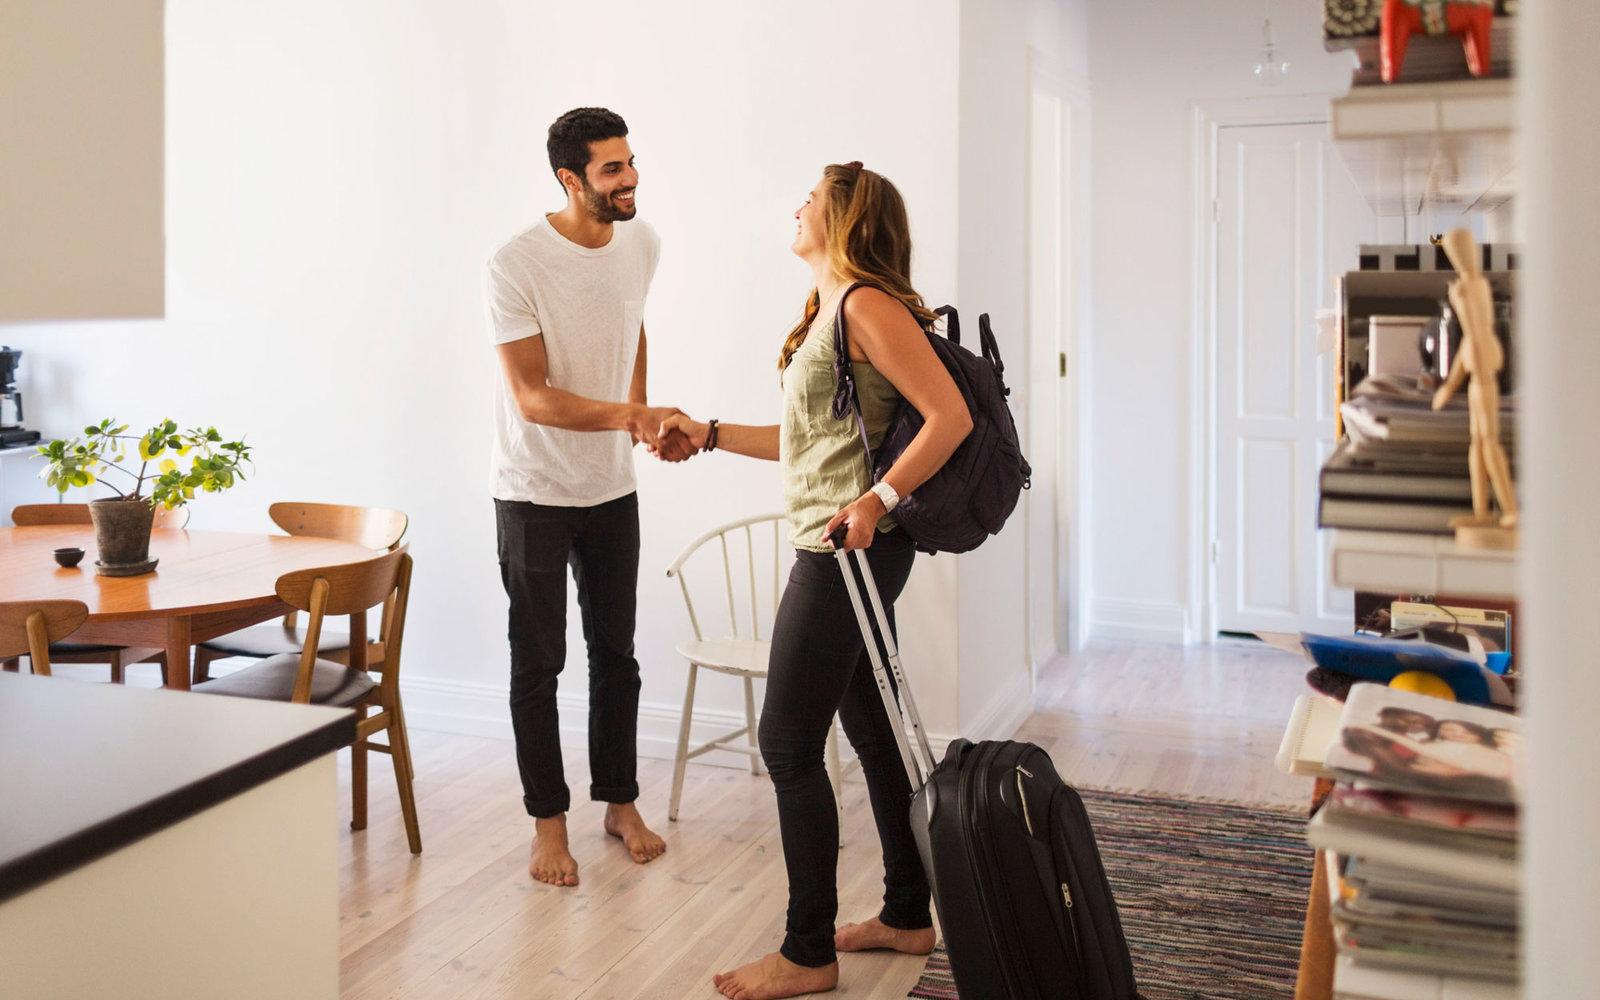 airbnb-etiquette-tips0316.jpg